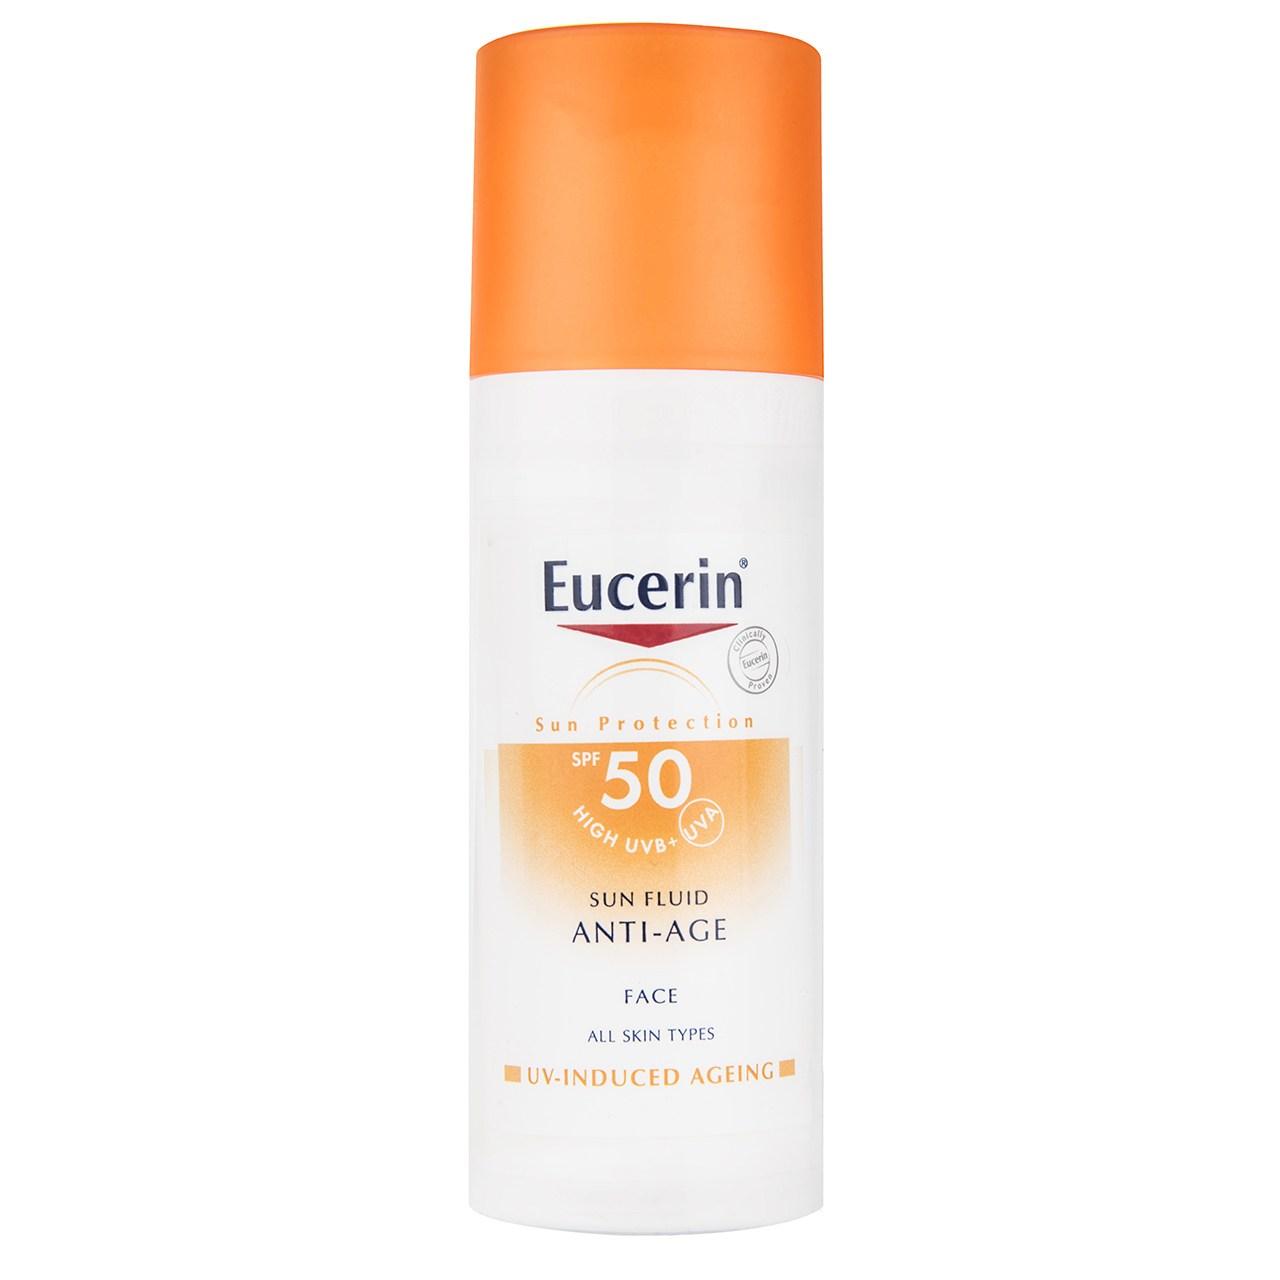 قیمت فلوئید ضد آفتاب ضد چروک اوسرین سری Sun Protection Spf50 حجم 50 میلی لیتر